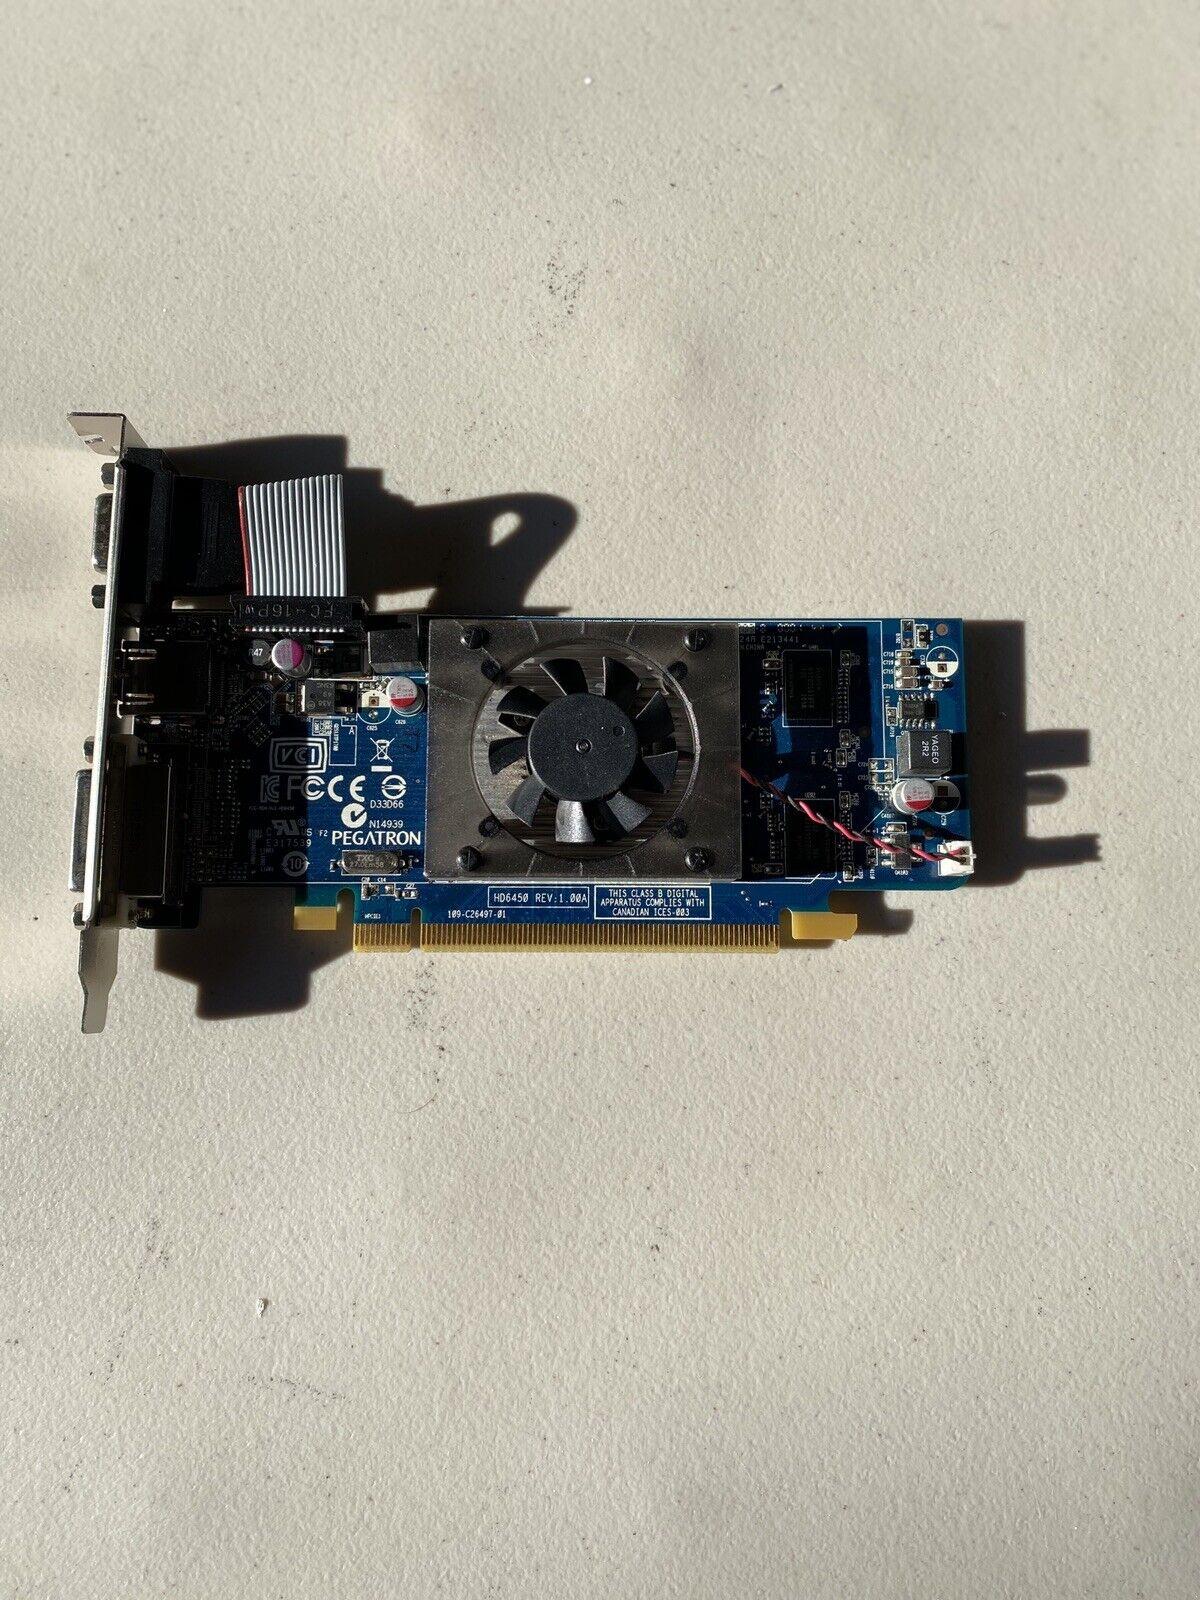 AMD Radeon HD6450 Video Graphics Card 1GB DDR3 HDMI VGA DVI-D